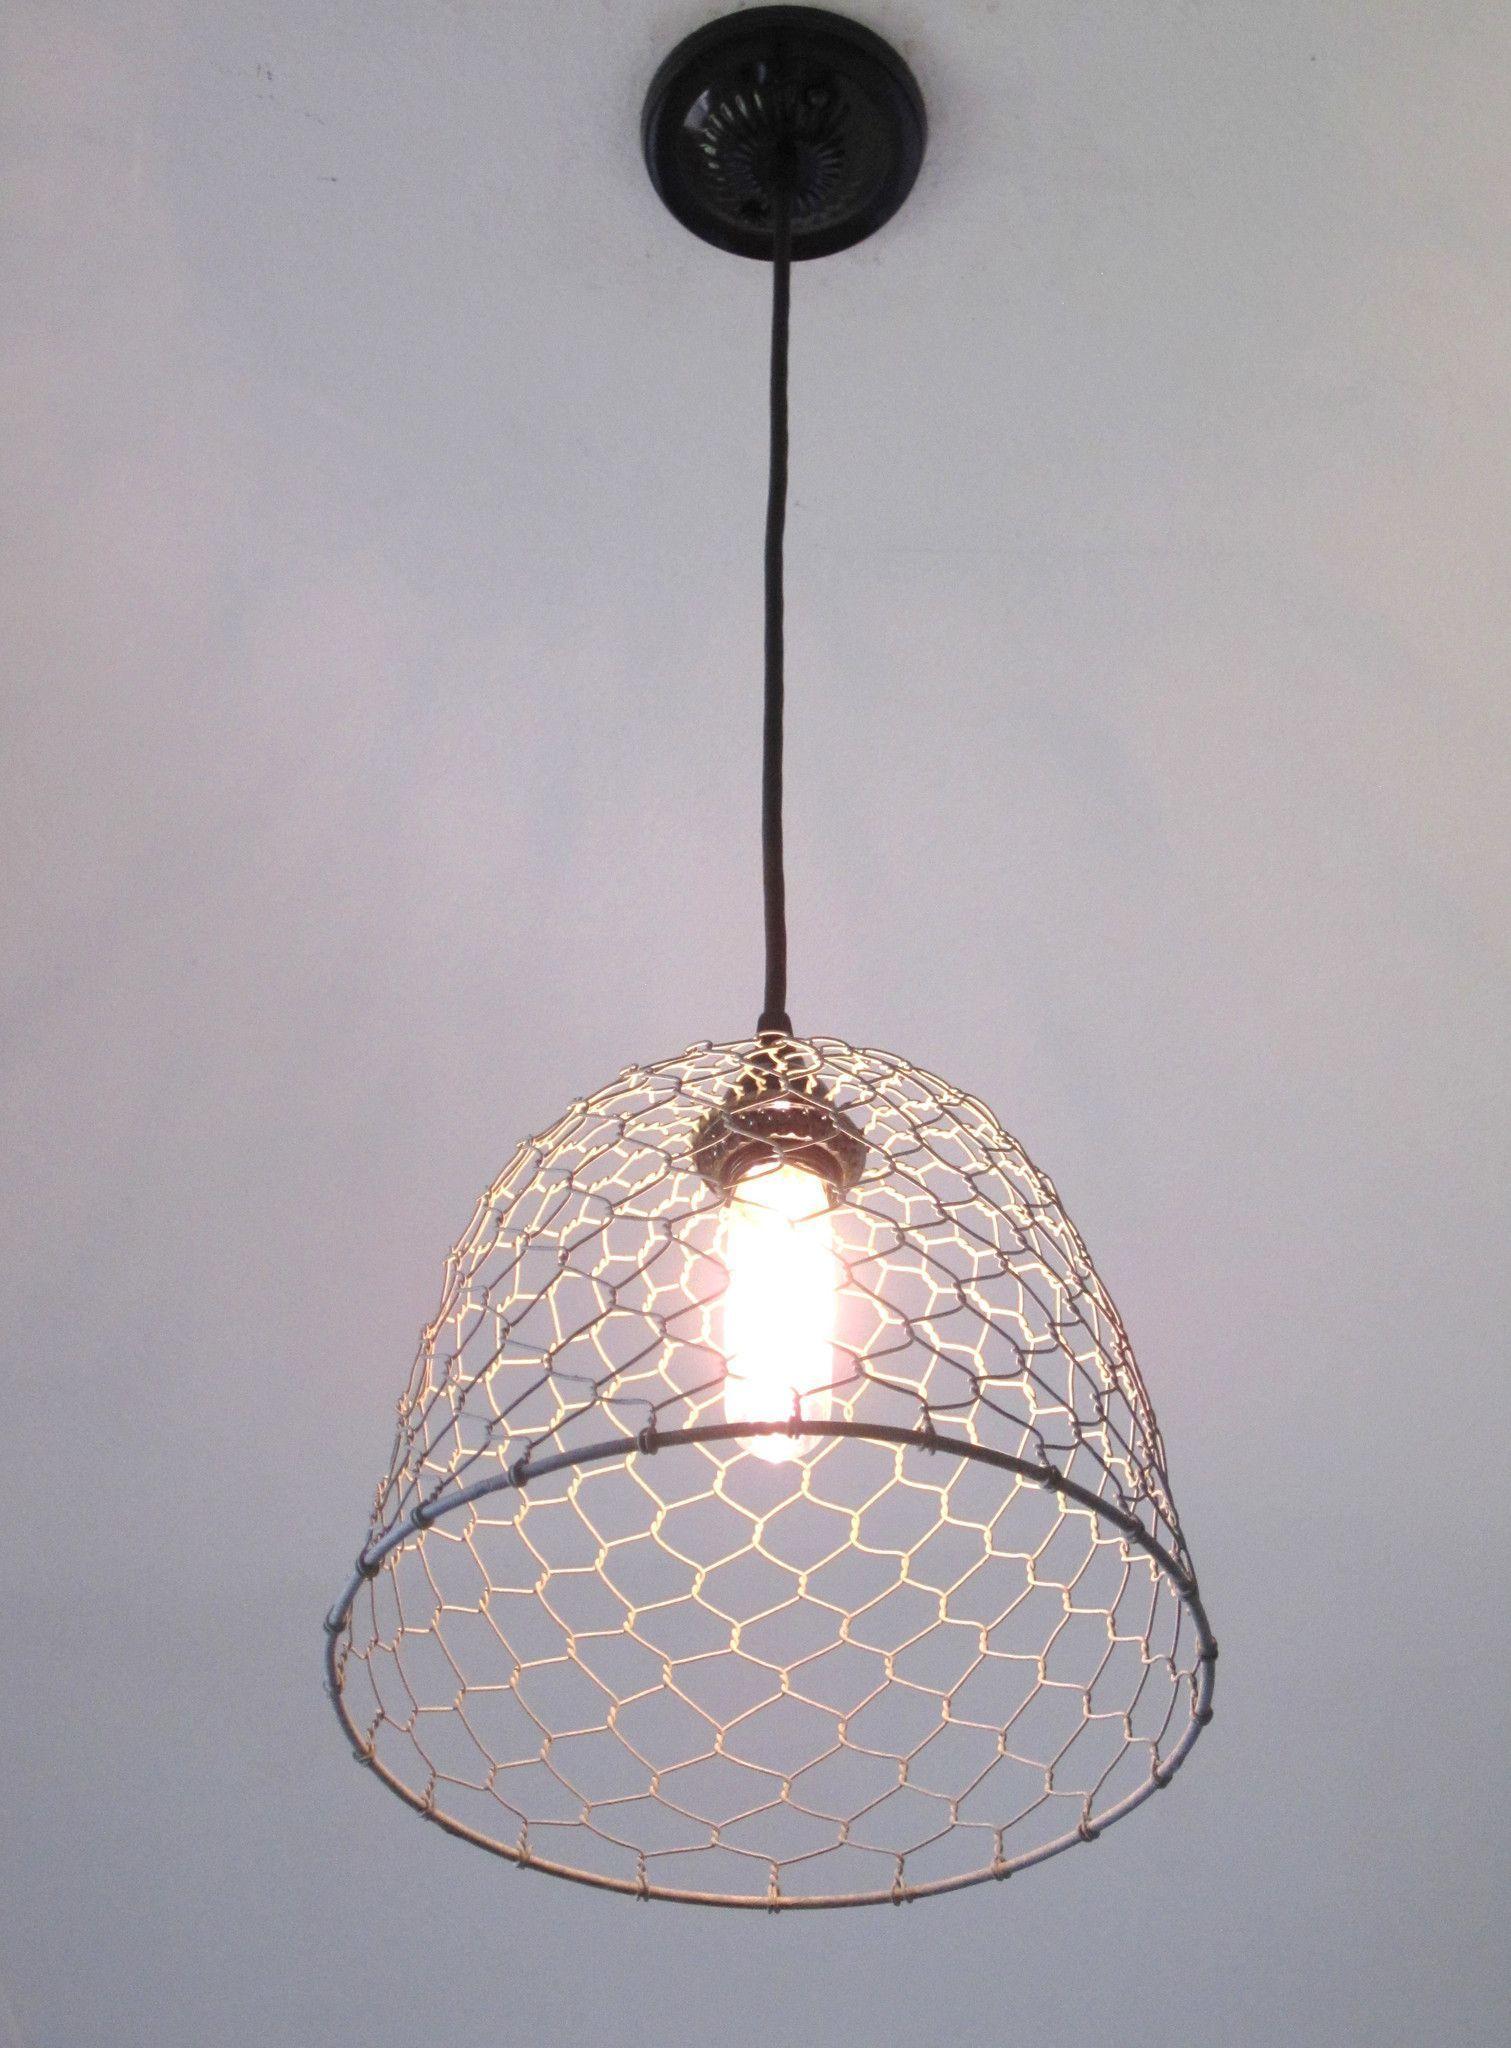 Chicken Wire Dome Pendant Lighting Pinterest Wiring A Light Fixture